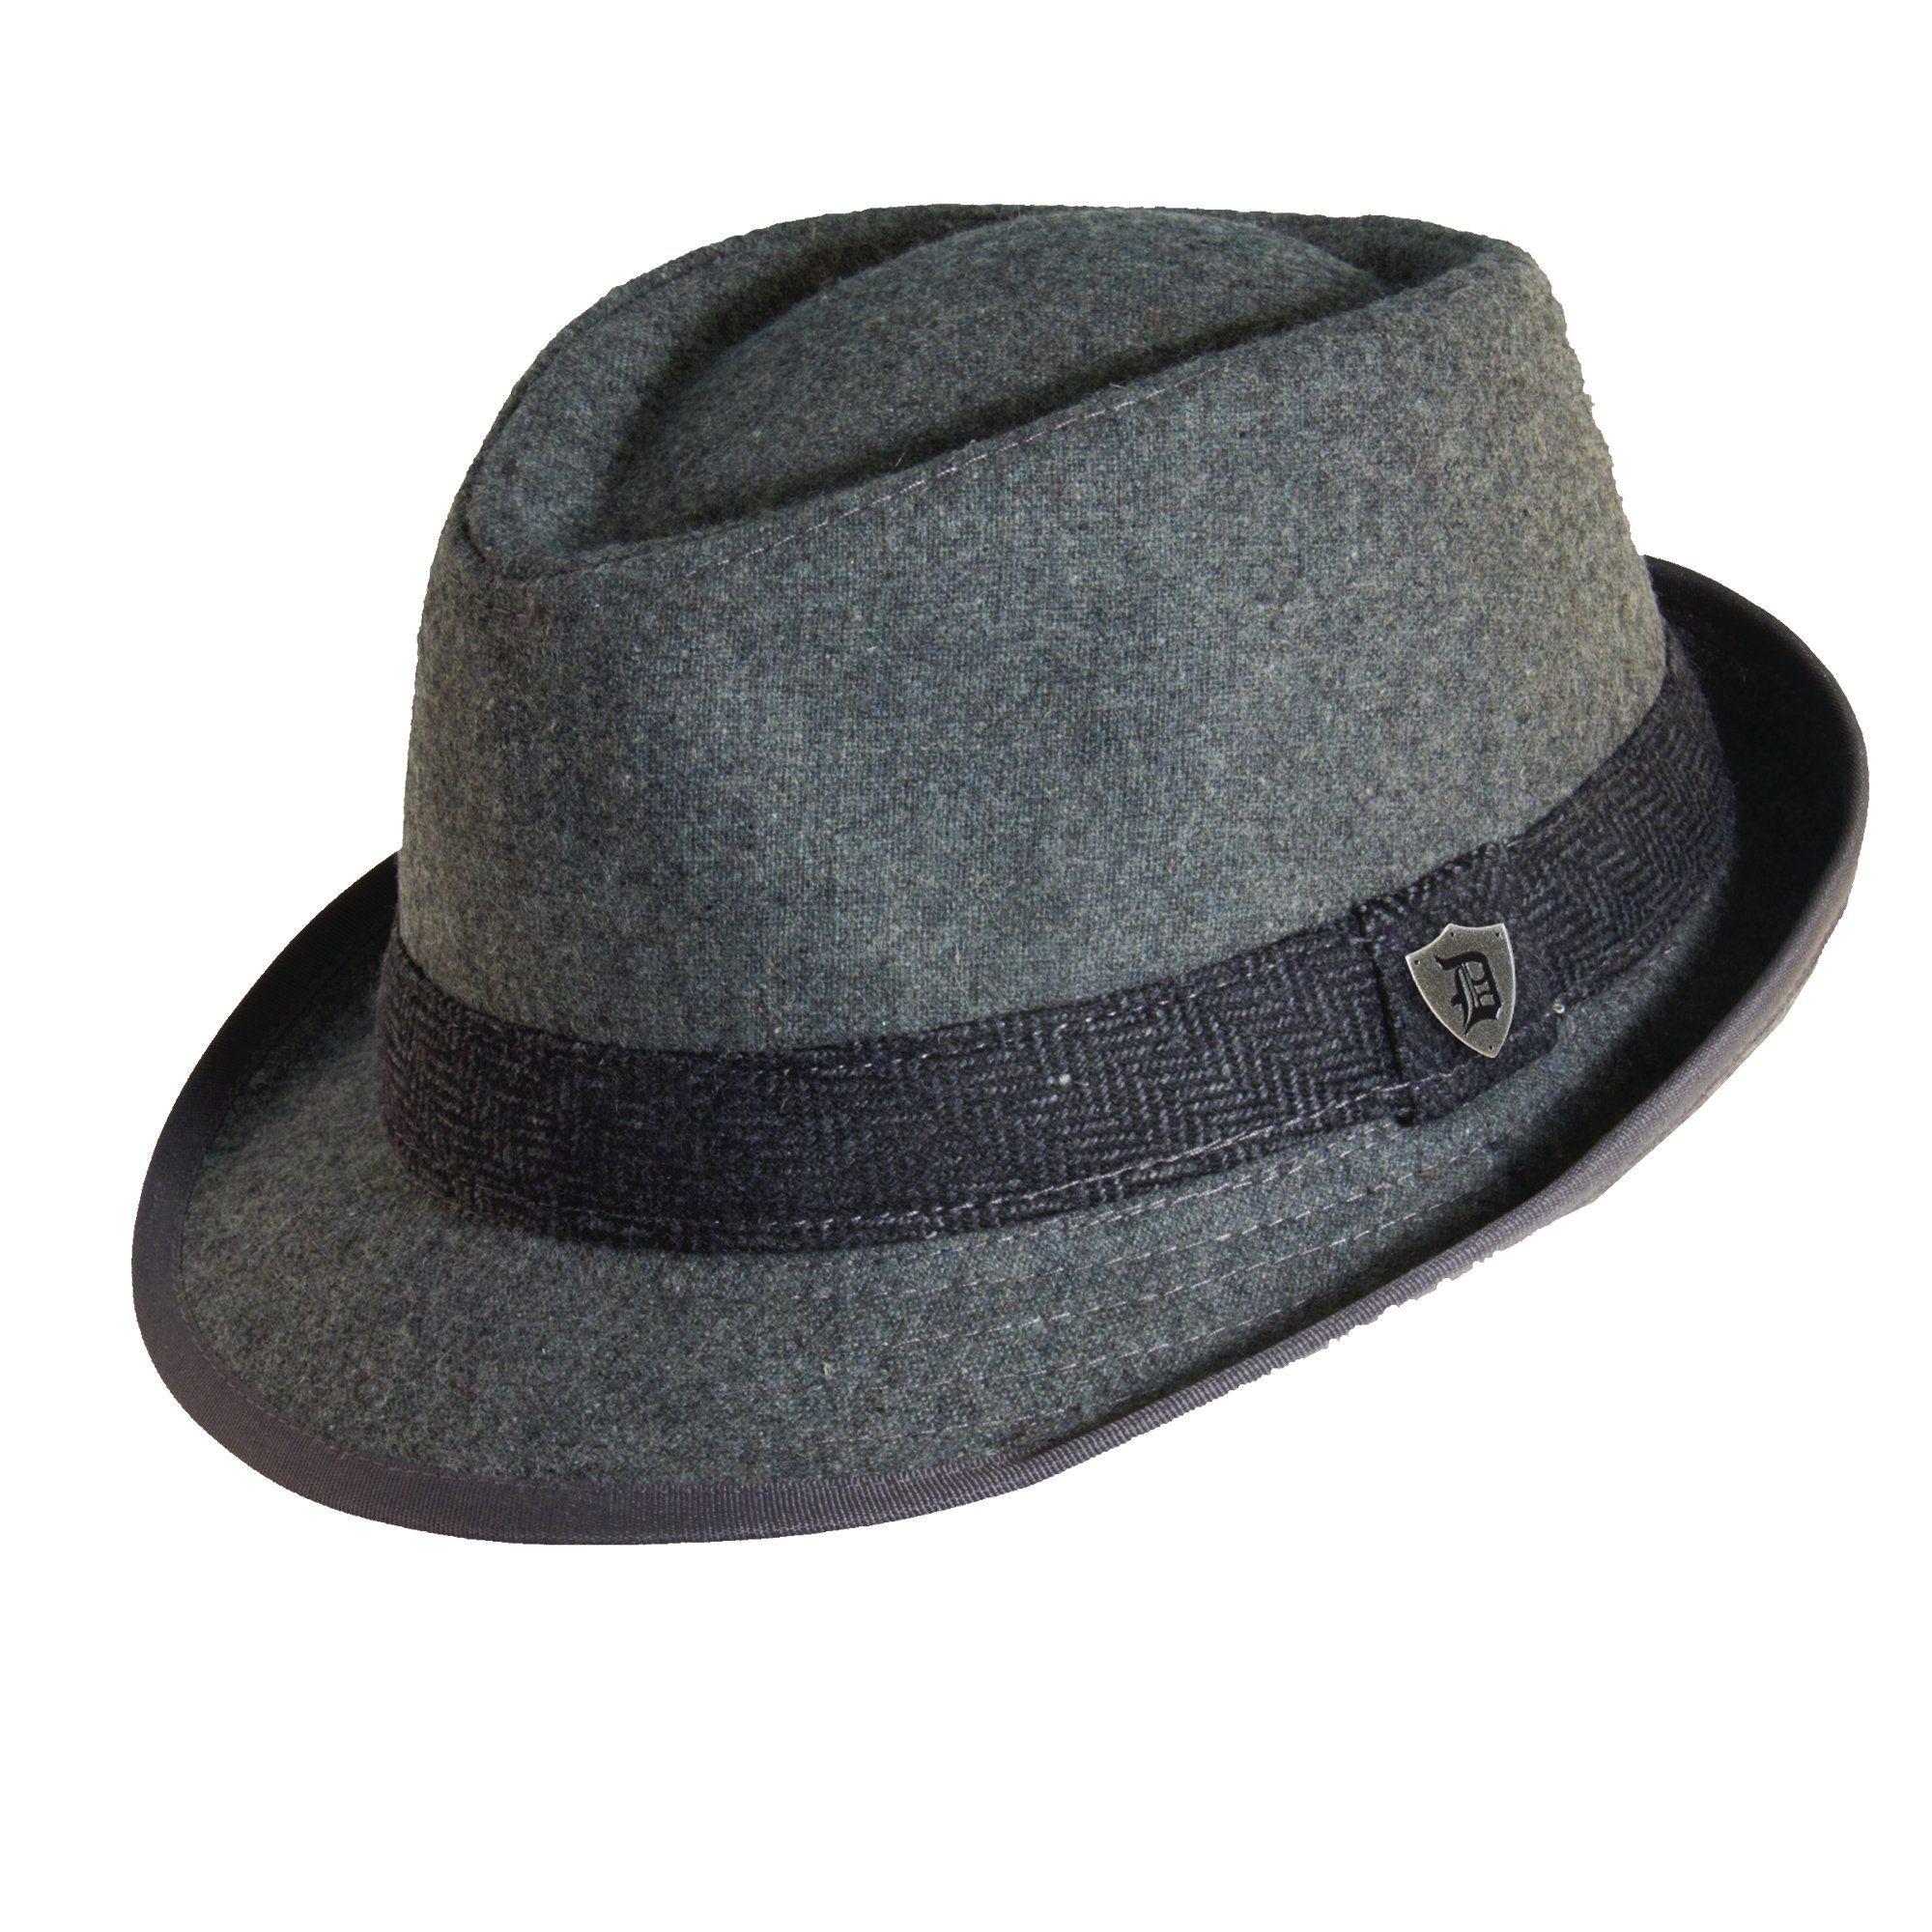 163f6e269604 Dorfman Pacific Men's Wool Blend Fedora Hat with Herringbone Band ...